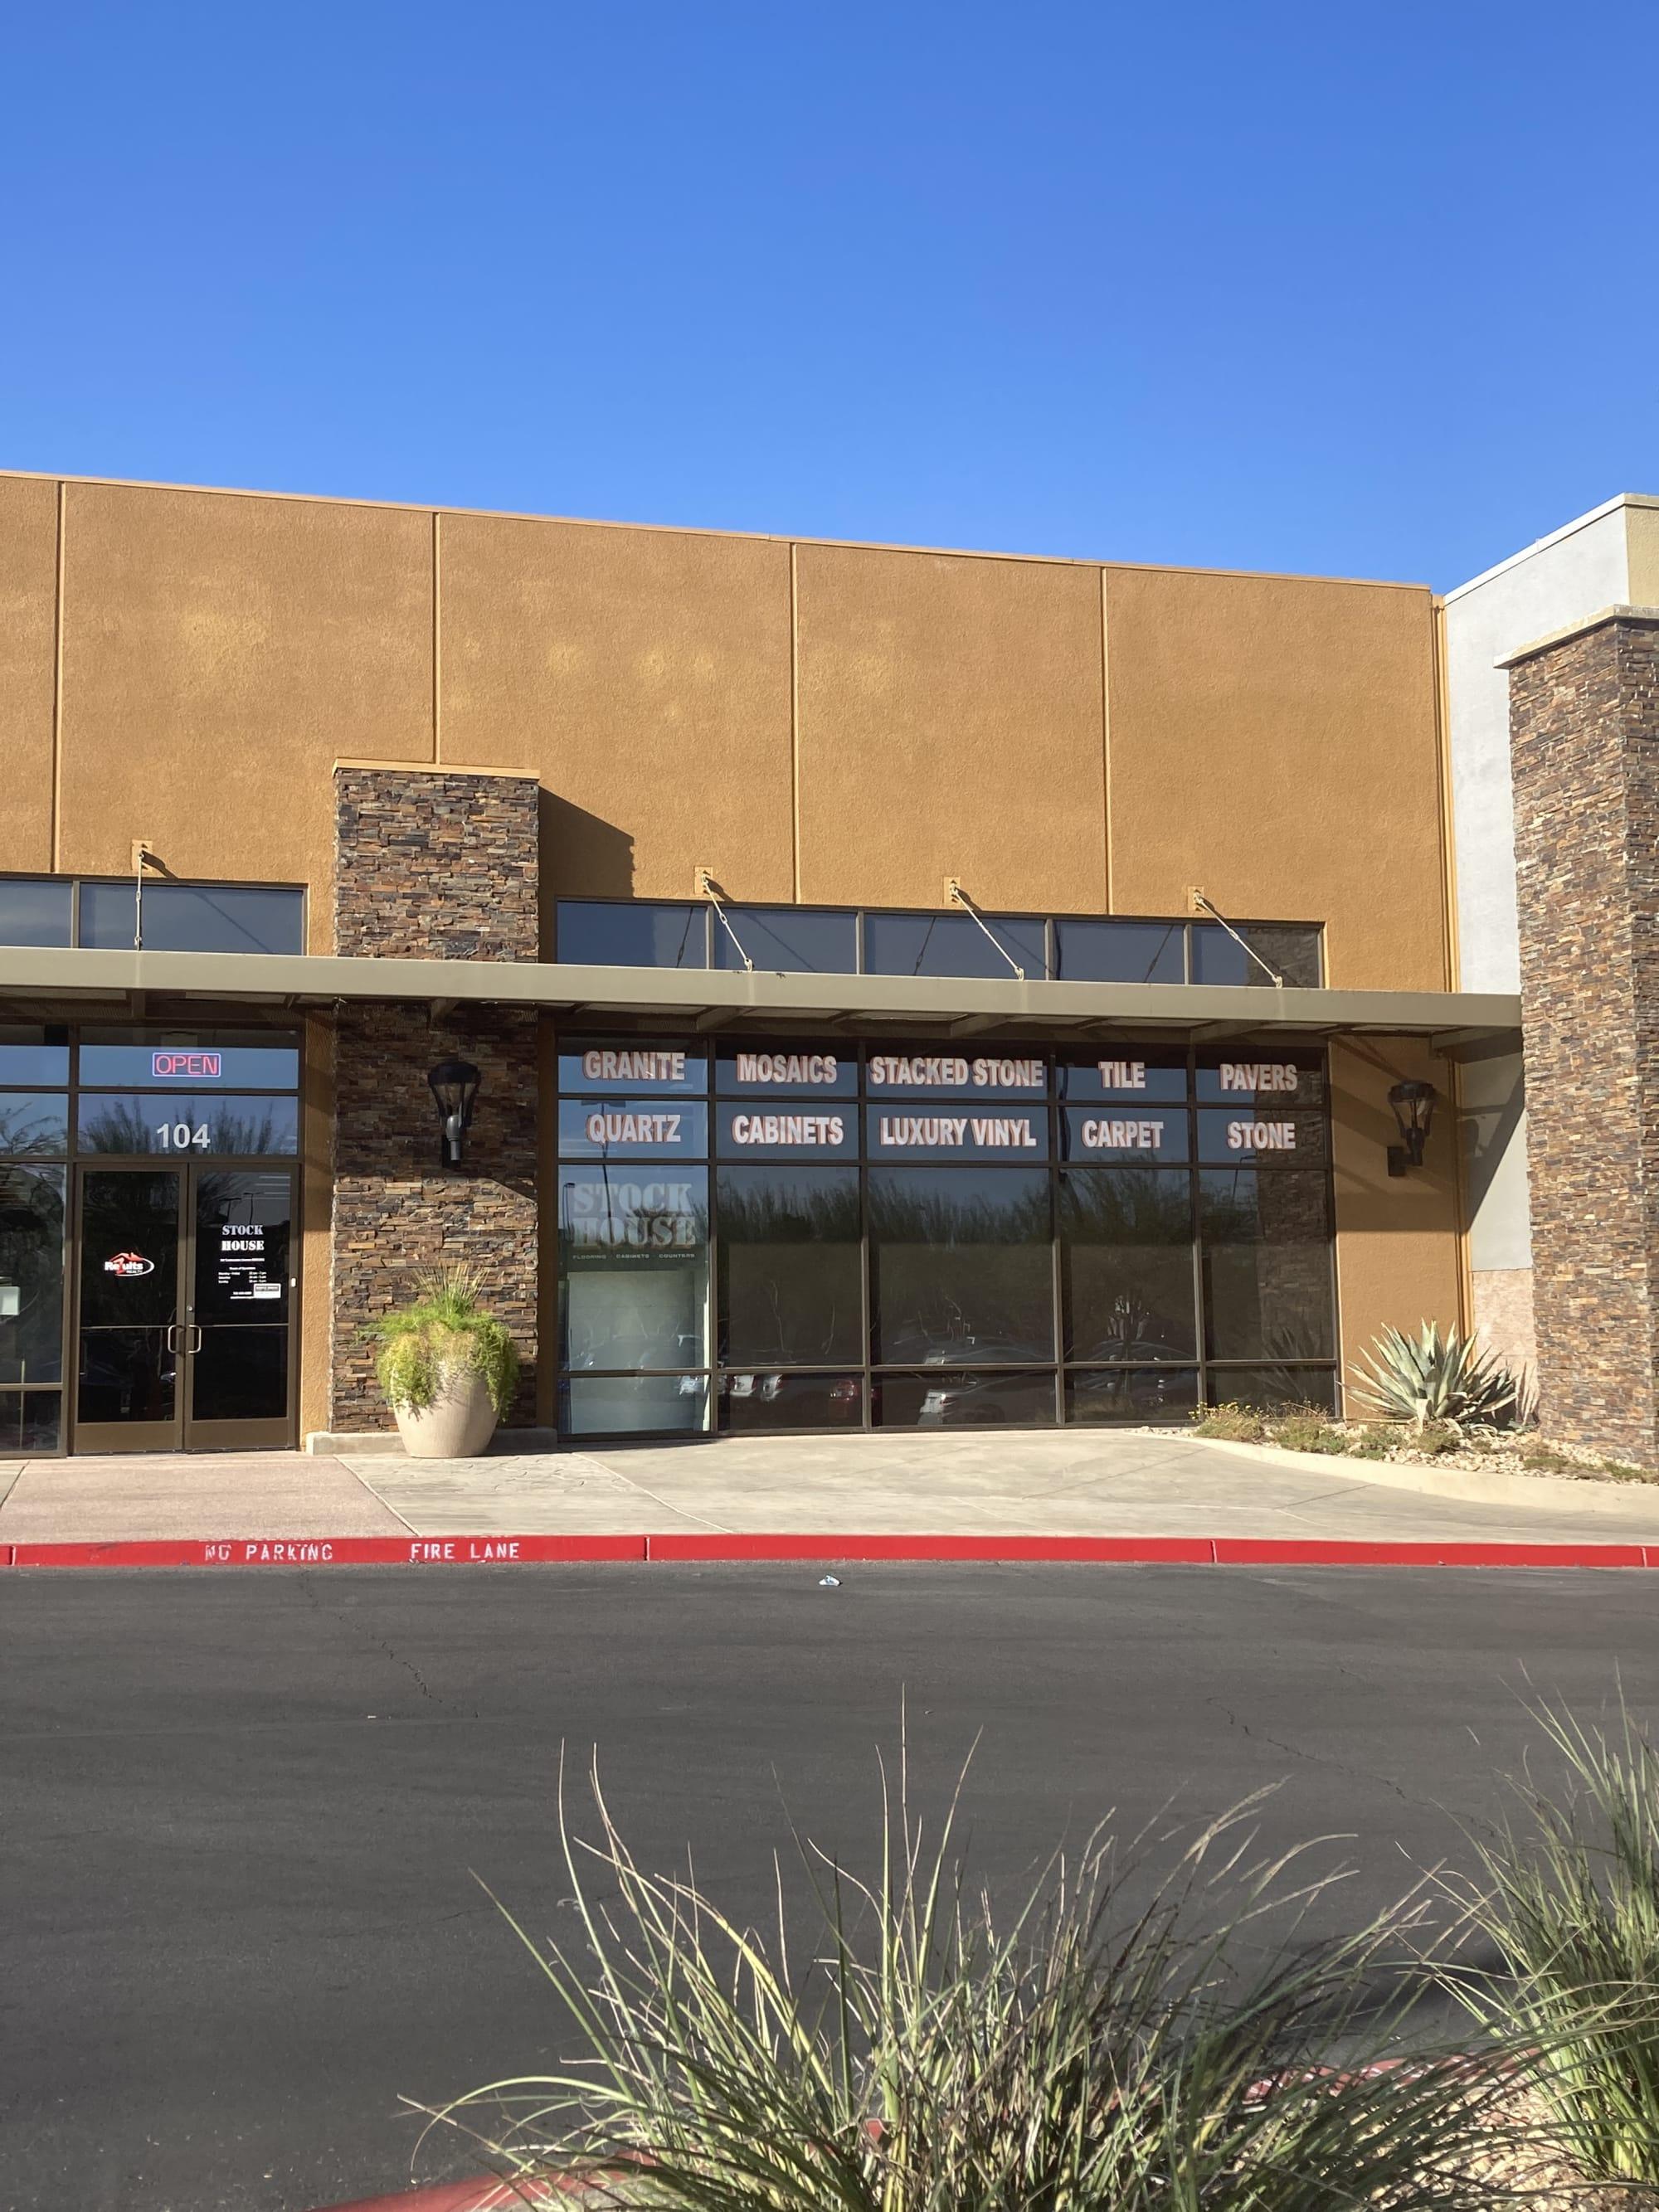 Stock House - 7280 Arroyo Crossing Pkwy #104 Las Vegas, NV 89113